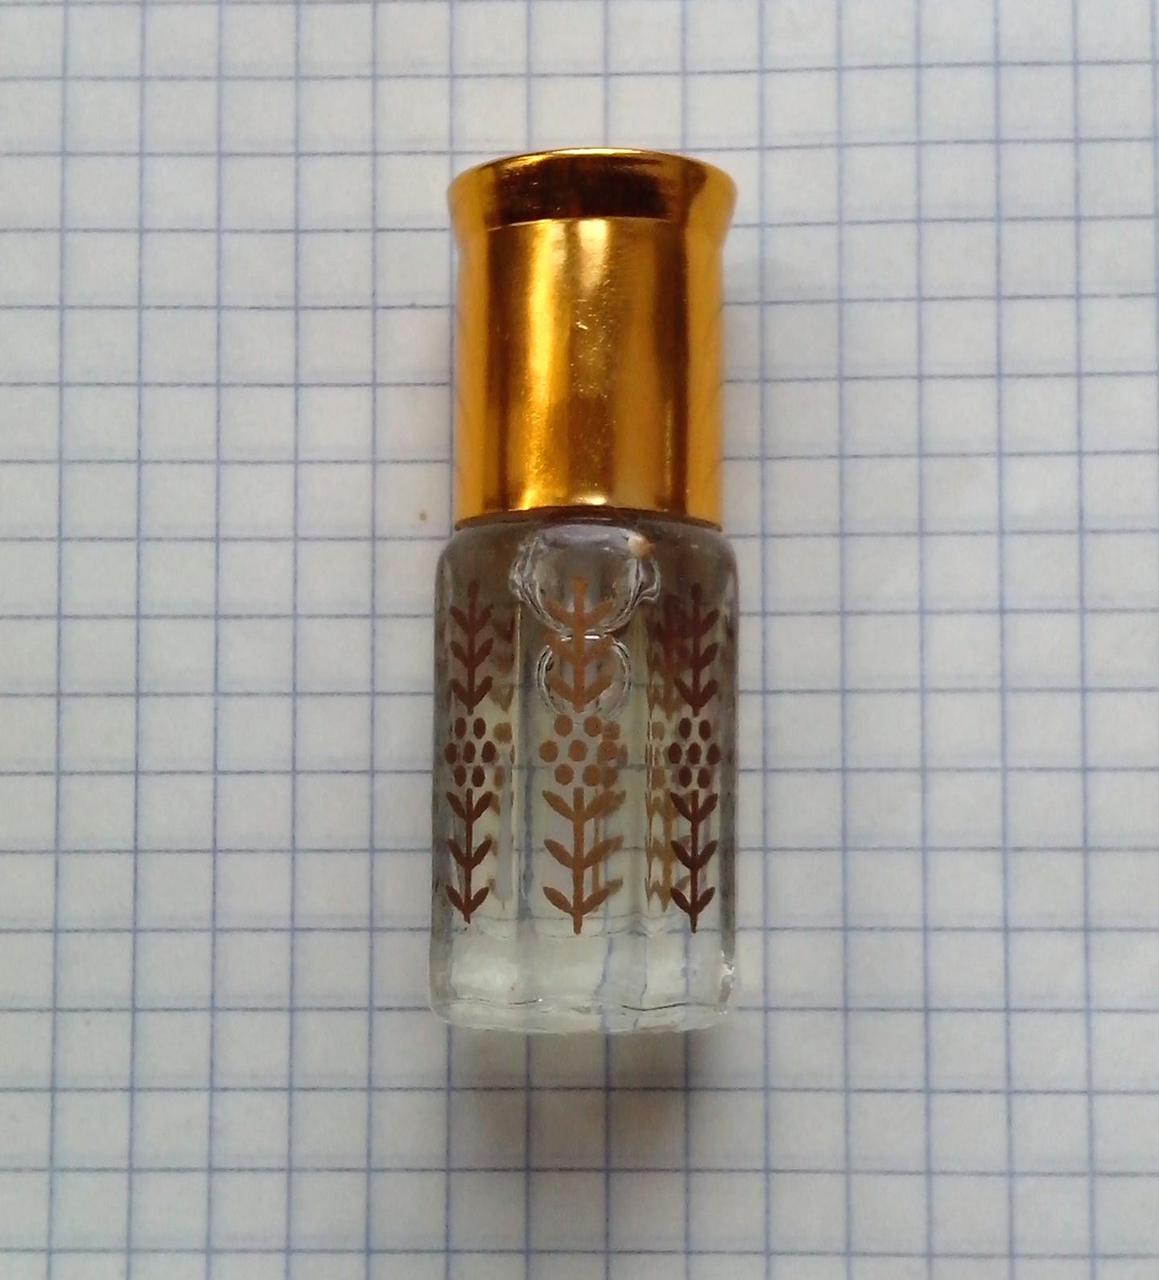 Opium Yves saint Laurent арабские масляные духи 3 мл